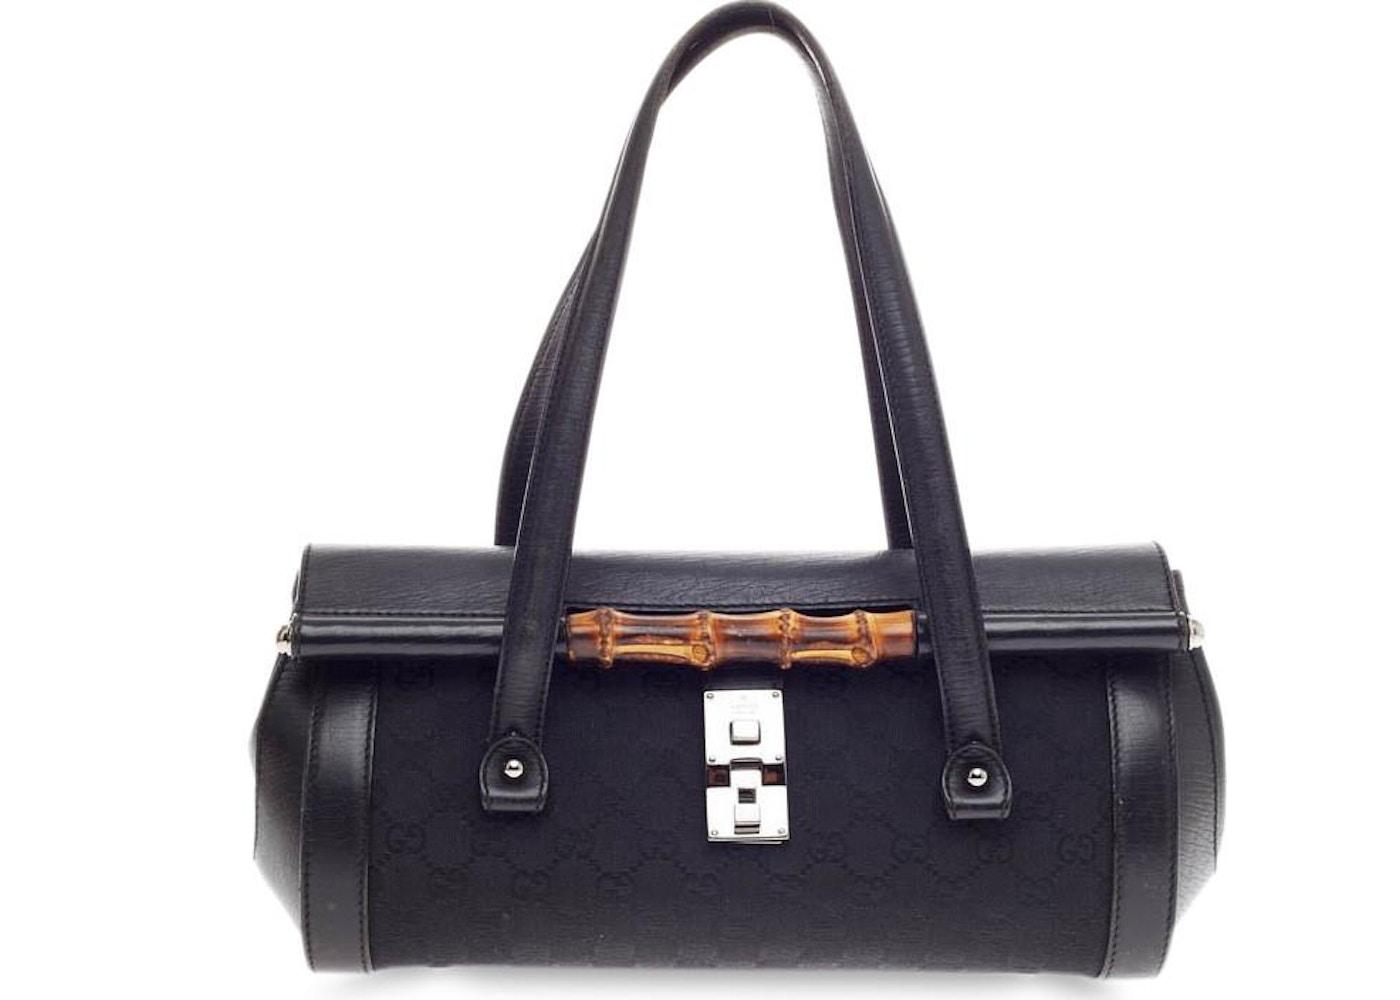 8753395eb5dedd Gucci Bamboo Bullet Bag GG Monogram Canvas and Bamboo Details ...